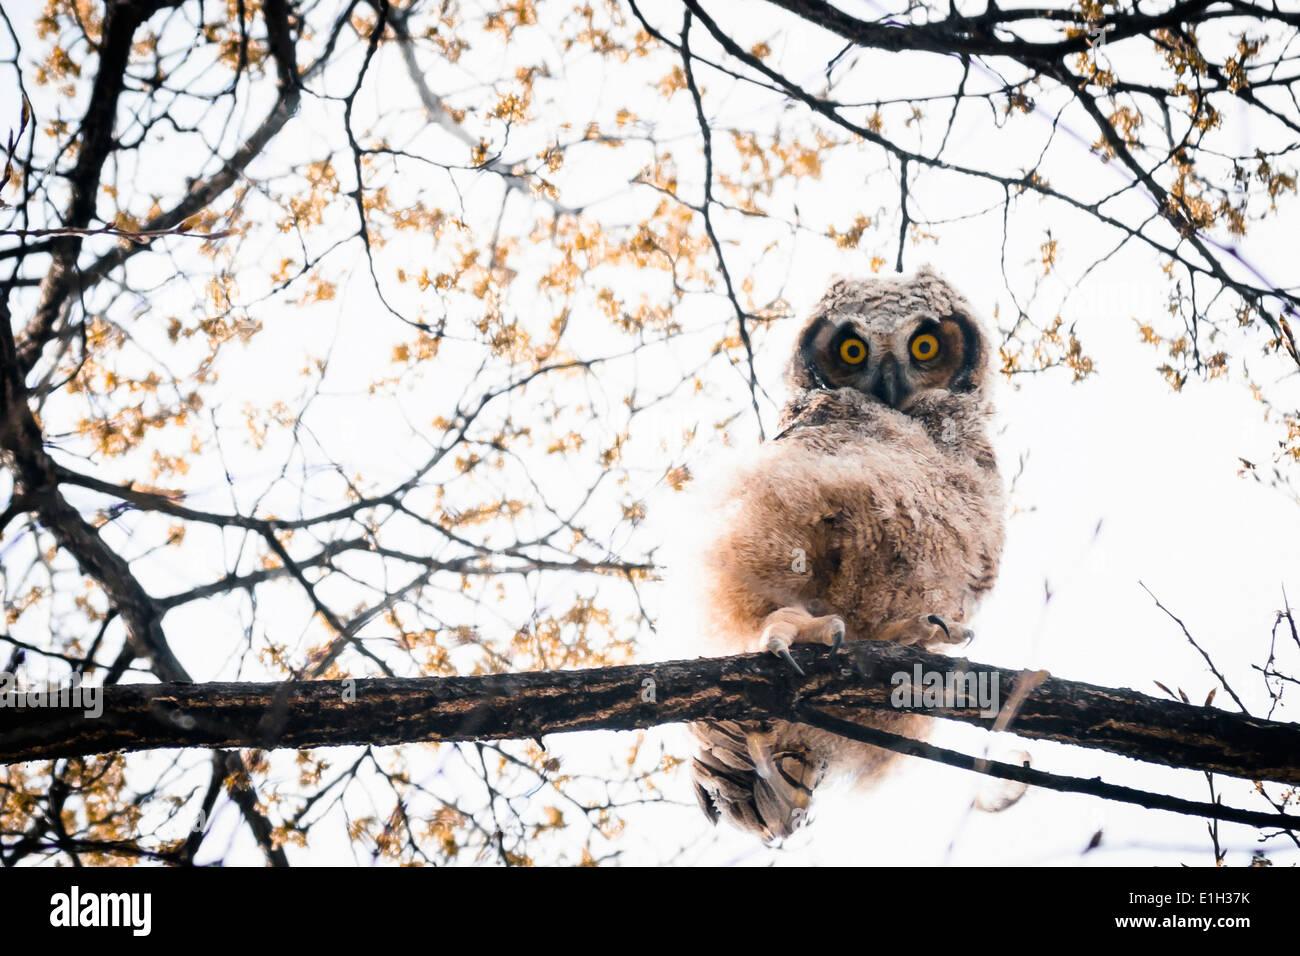 Great Horned Owlet (Bubo virginianus) peering down yellow eyes South Okanagan Valley Penticton British Columbia Canada - Stock Image